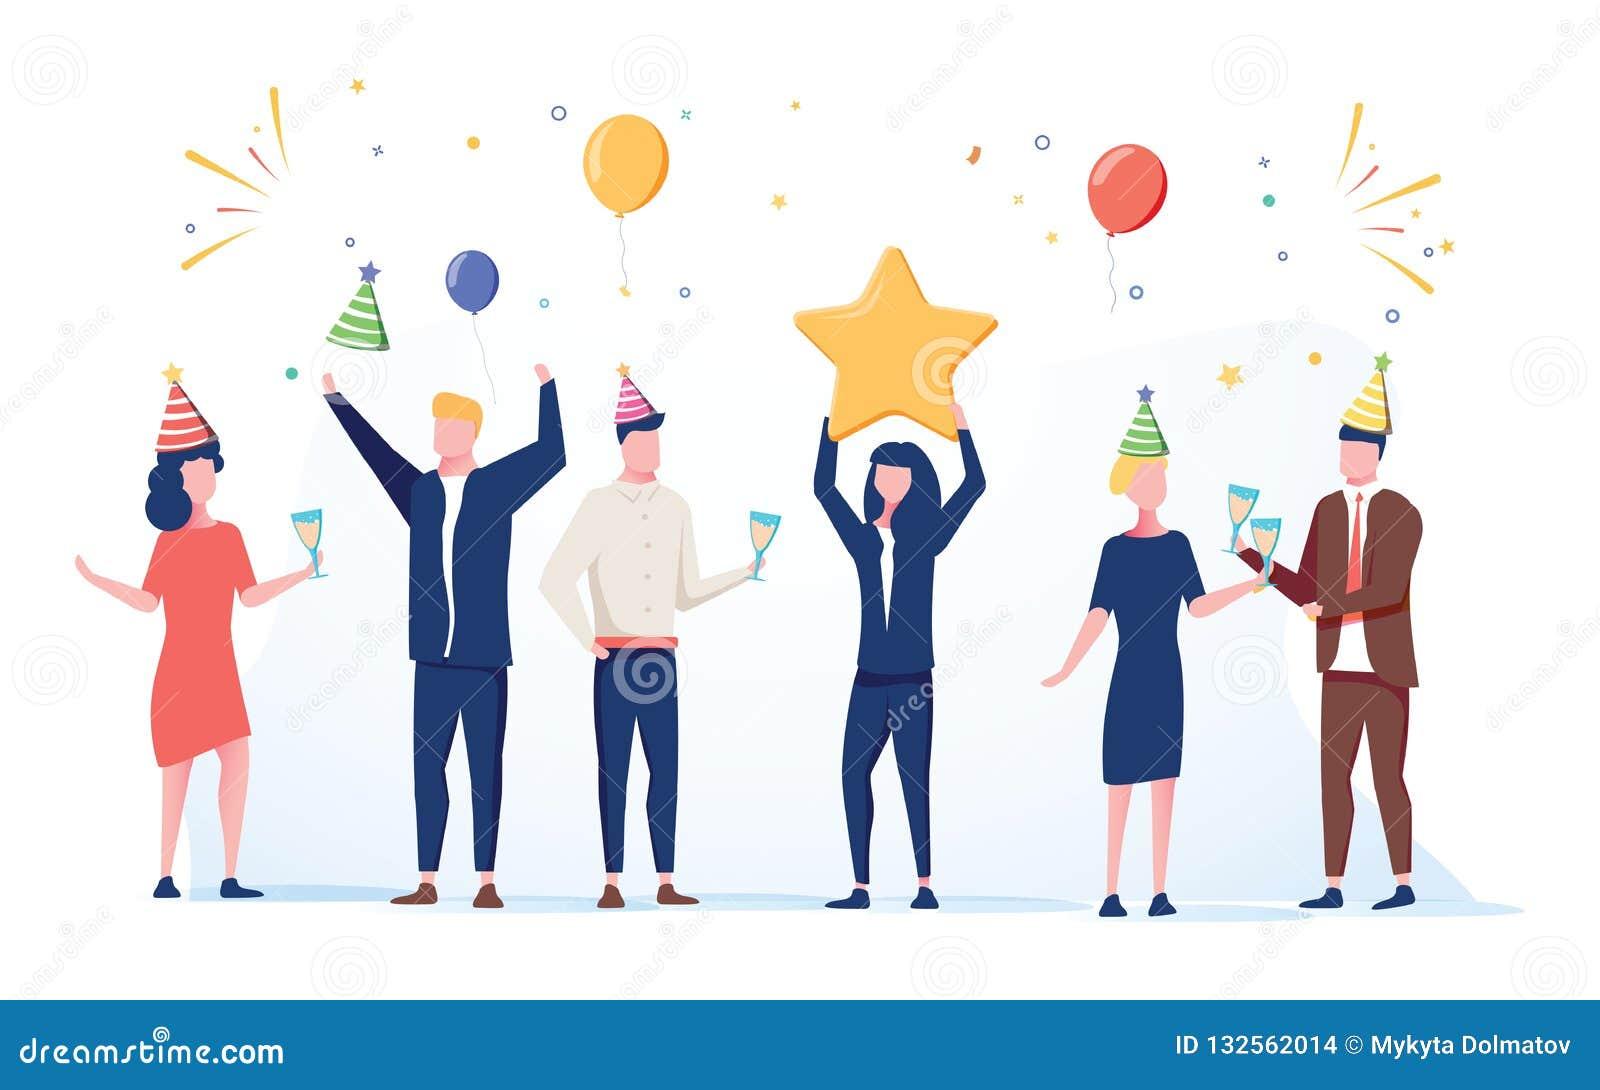 Cartoon Happy Little People. Cute Miniature Scene Of Workers Preparing For  Celebration. Modern Cartoon Illustration. Stock Vector - Illustration of  background, celebration: 132562014